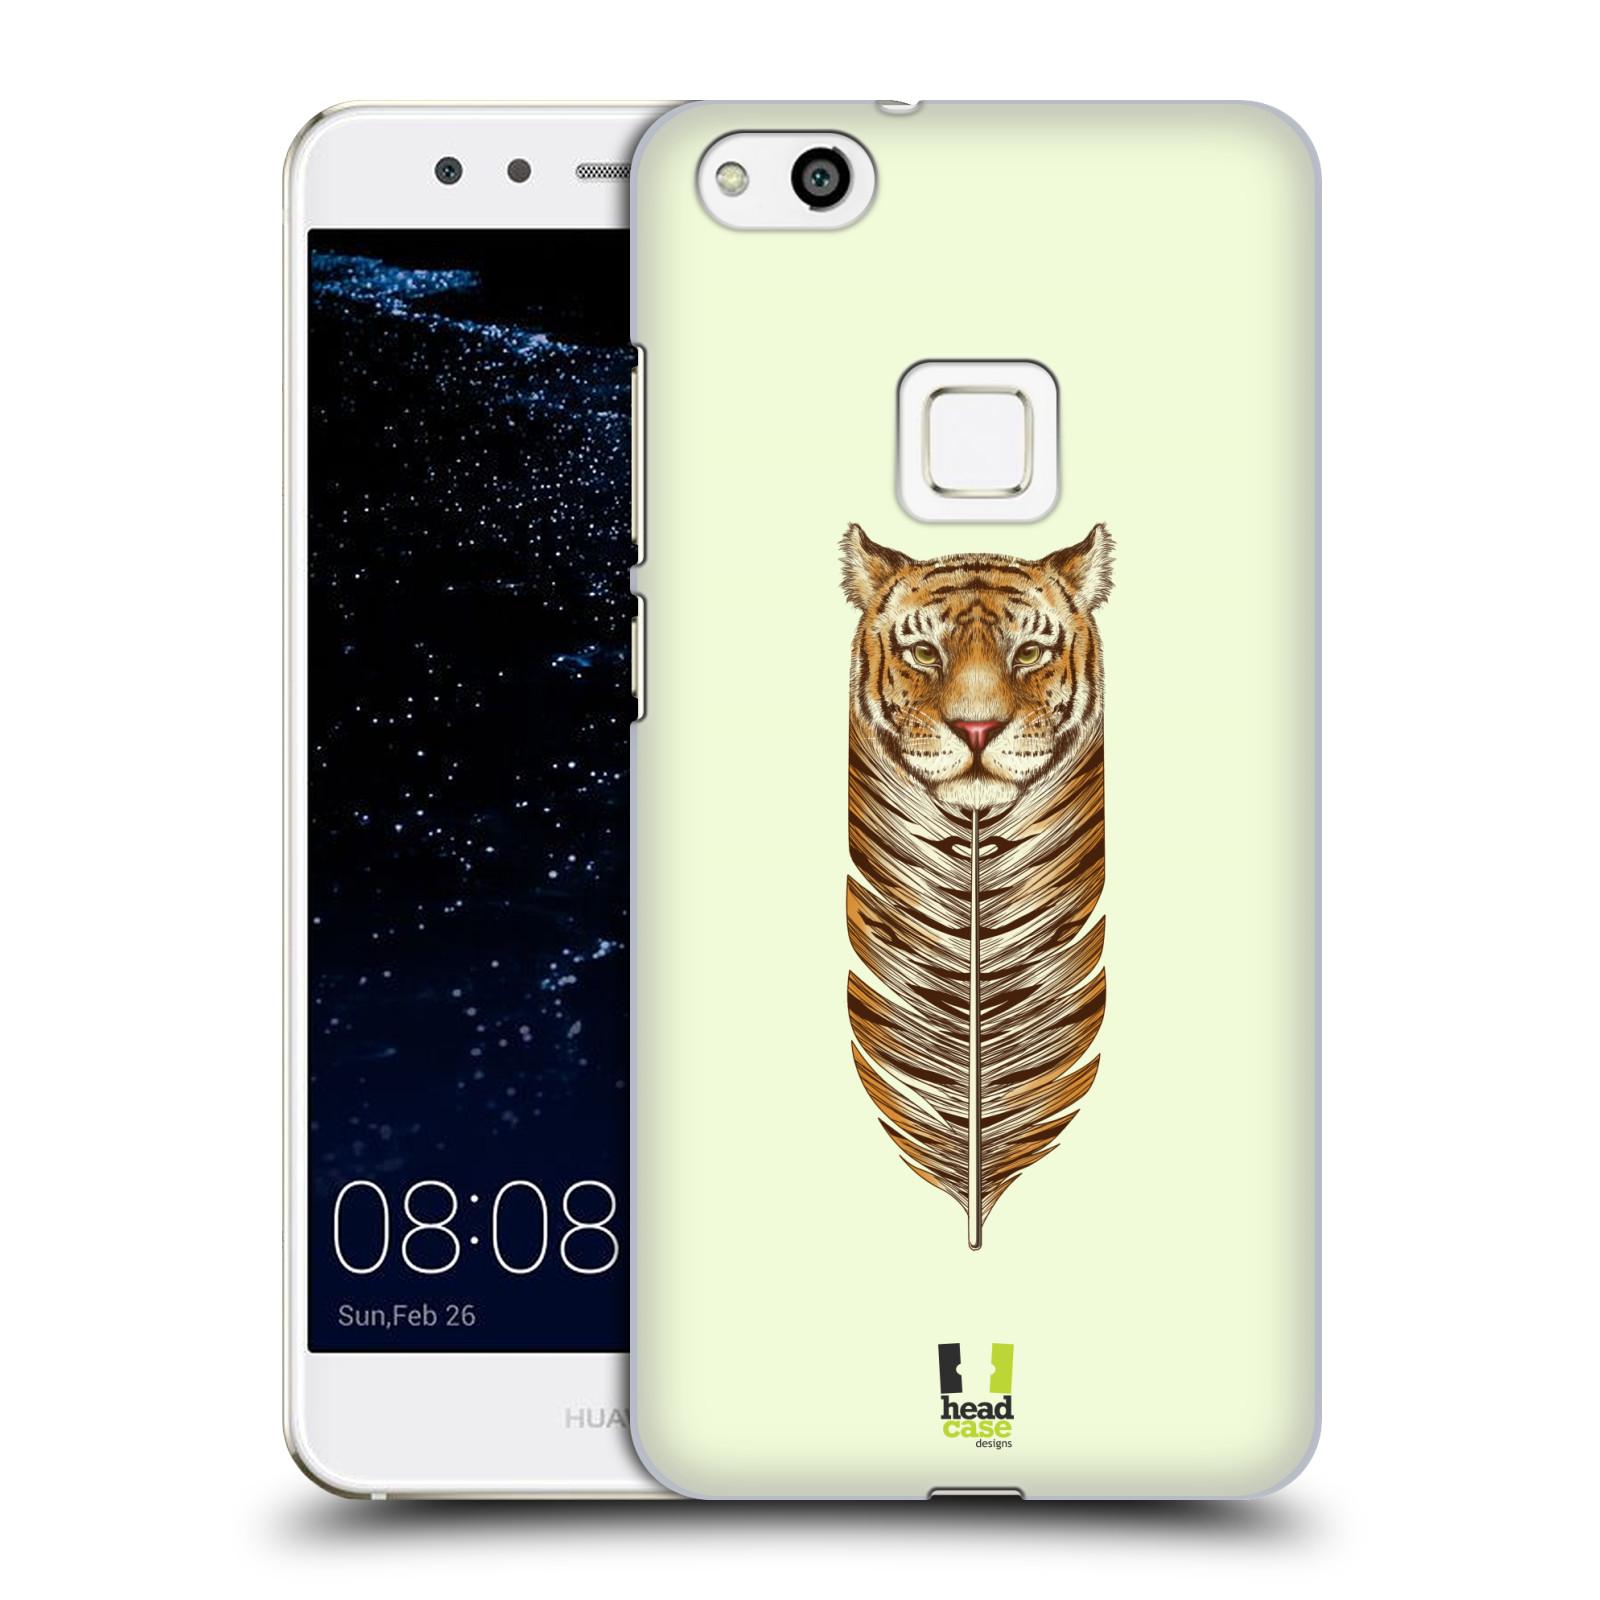 Plastové pouzdro na mobil Huawei P10 Lite Head Case - PÍRKO TYGR (Plastový kryt či obal na mobilní telefon Huawei P10 Lite Dual SIM (LX1/LX1A))